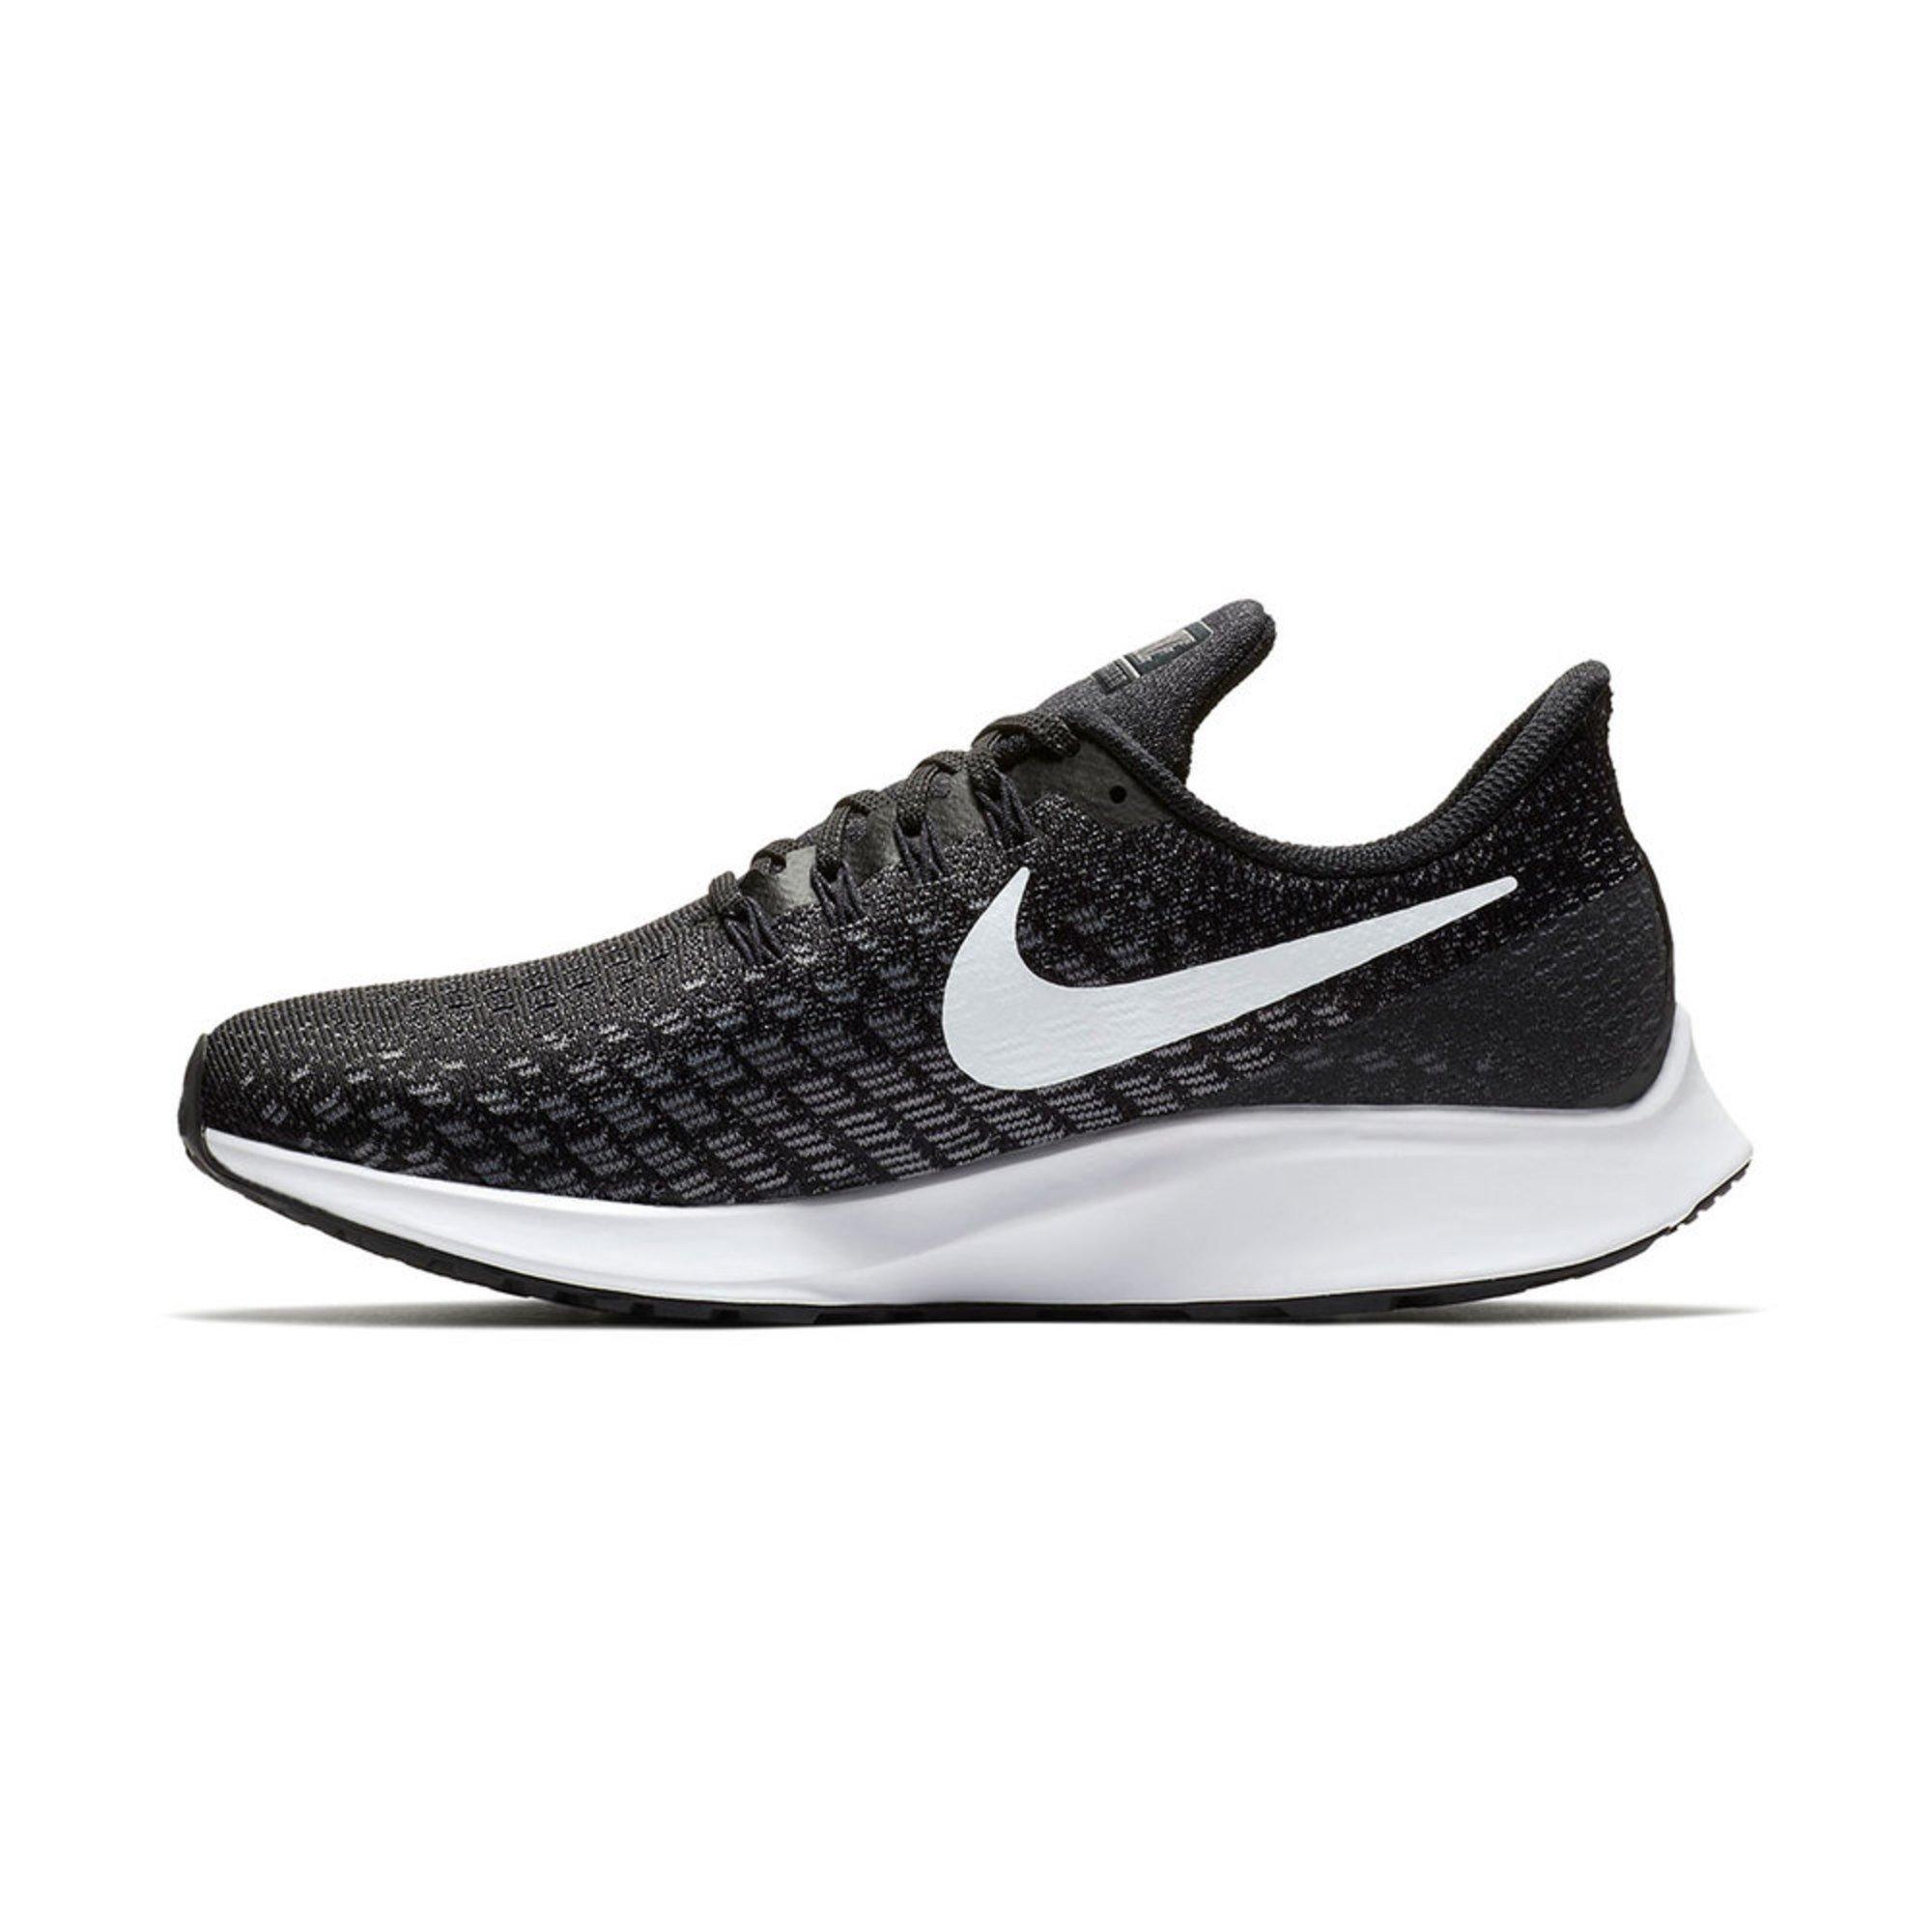 1fa6b3618f7 Nike. Nike Women s Air Zoom Pegasus 35 Running Shoe